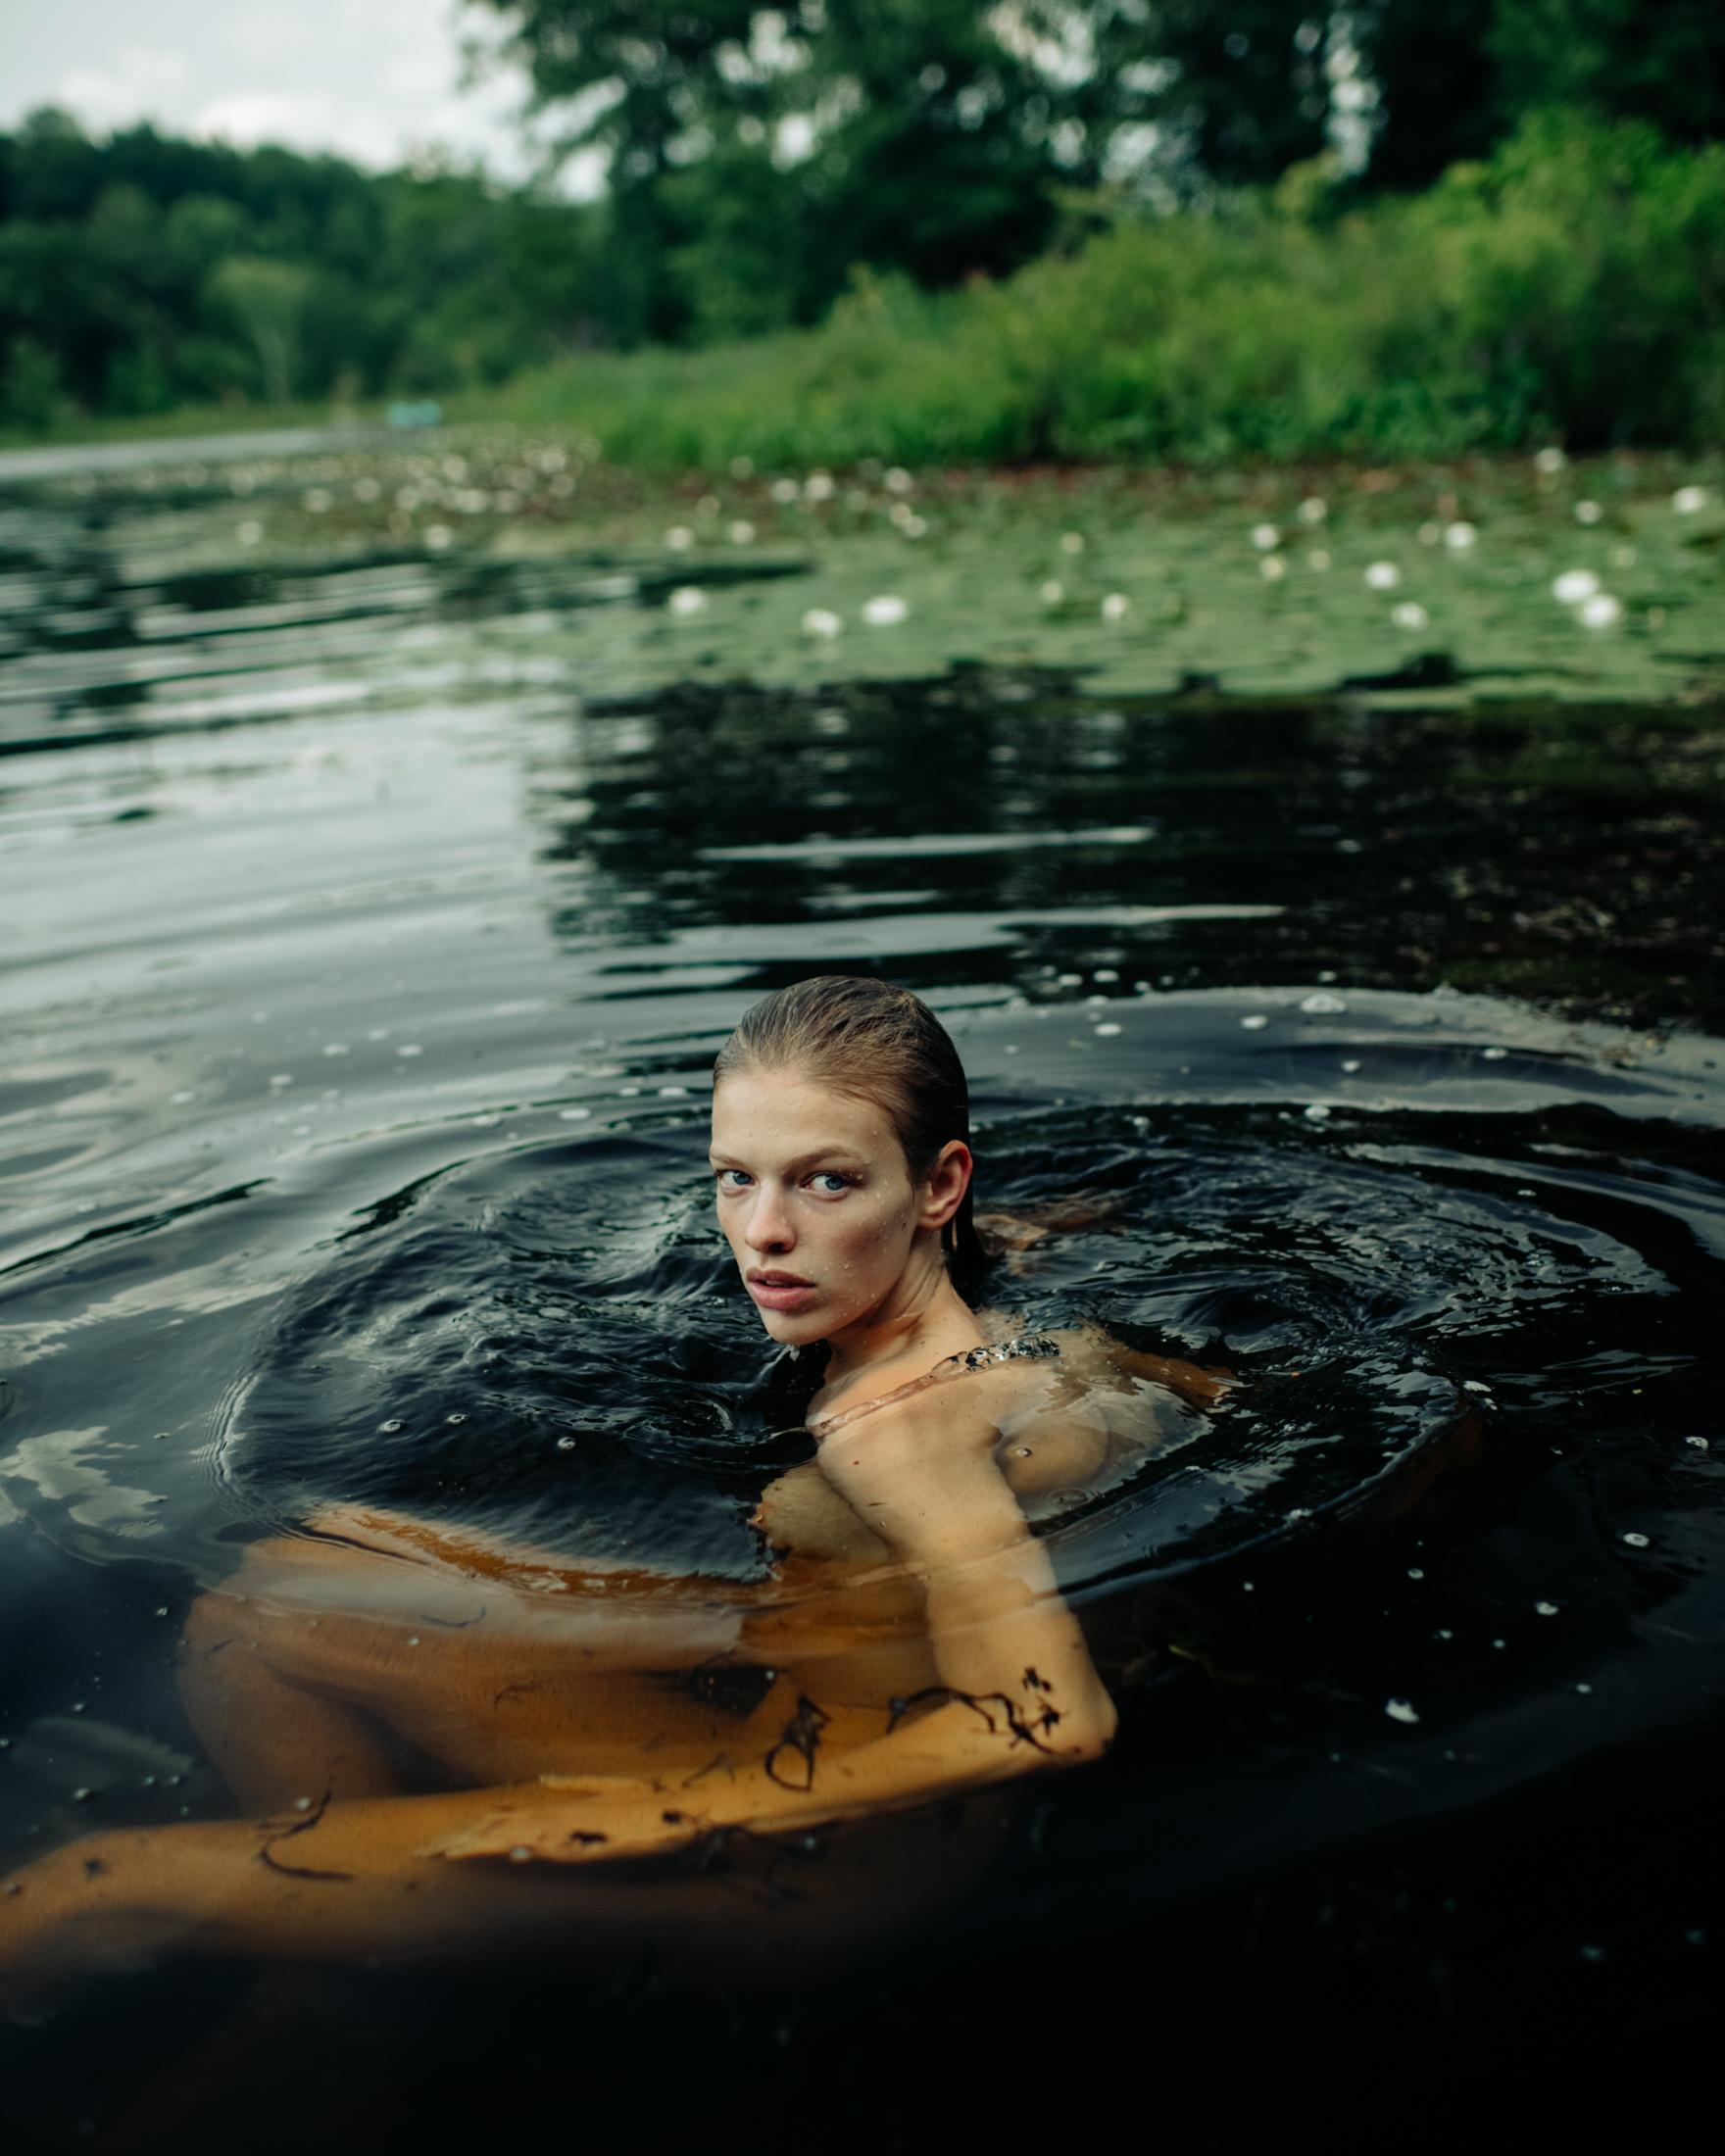 Clare-Crawford-by-Ivan-Bideac-for-Vogue-Italia-0912.jpg